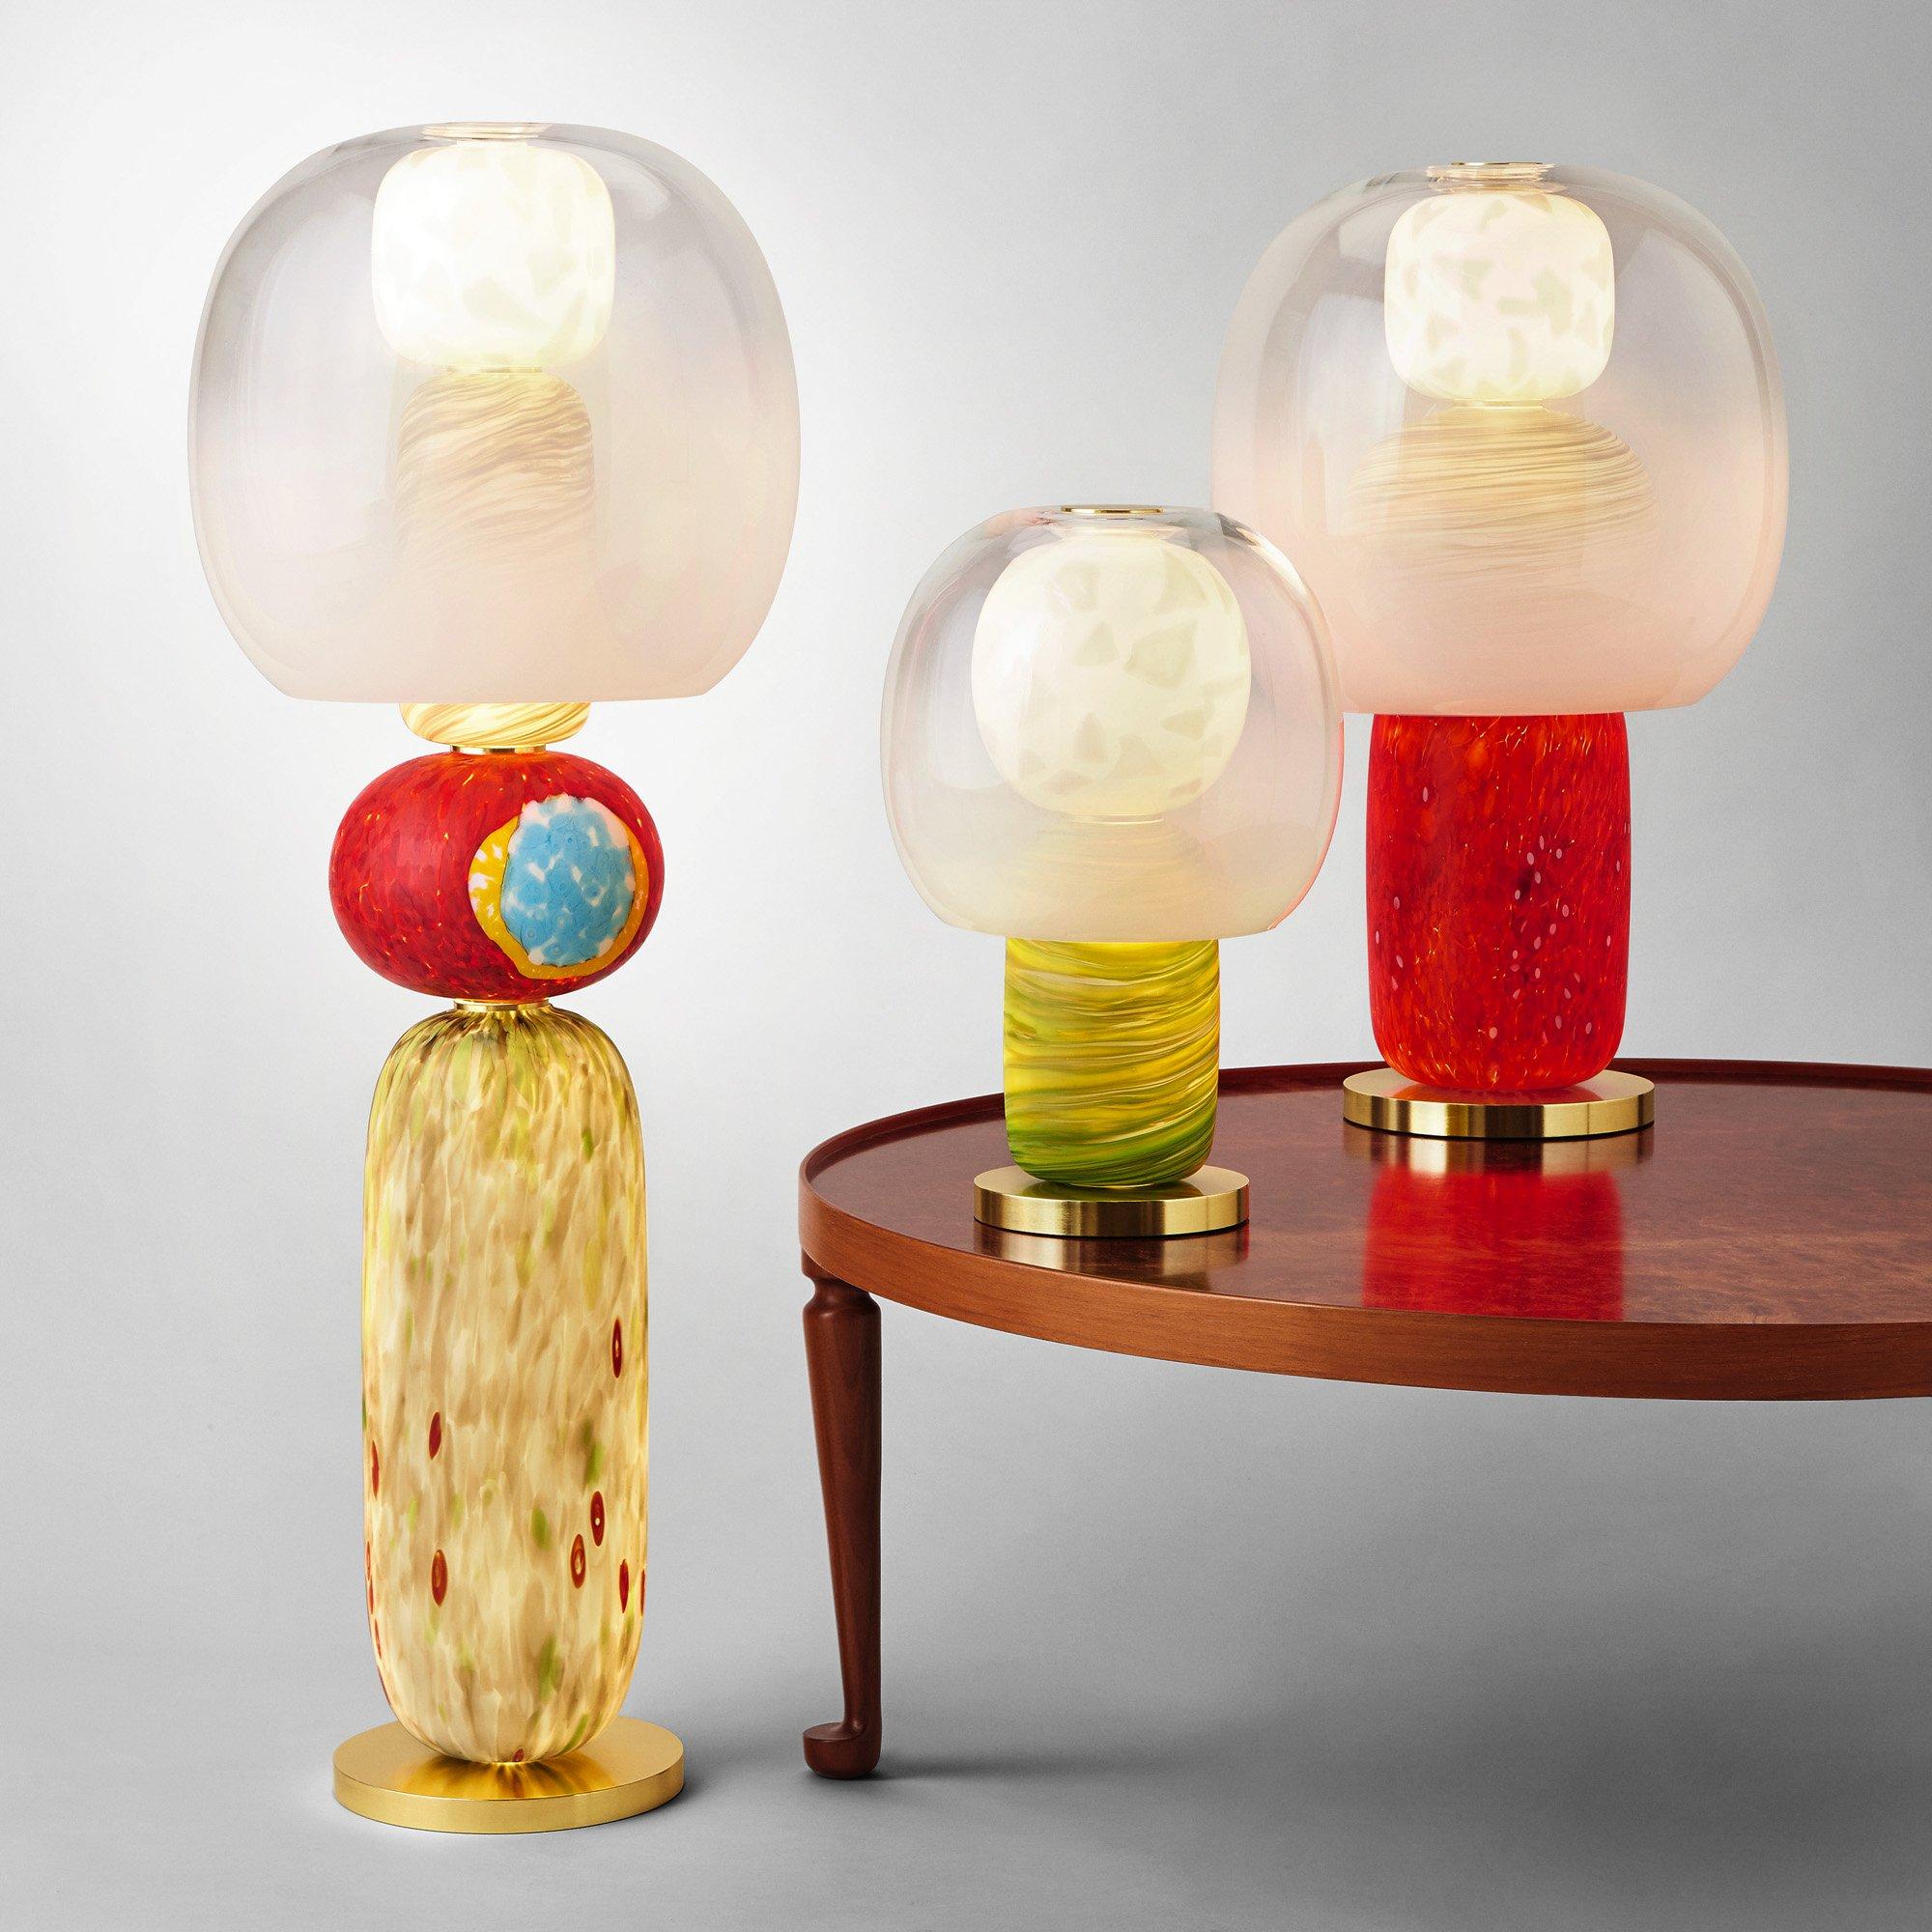 Design-by-Josef-Franck-in-glass- interpretation-Design-by-Josef-Franck-in-glass- interpretation-03